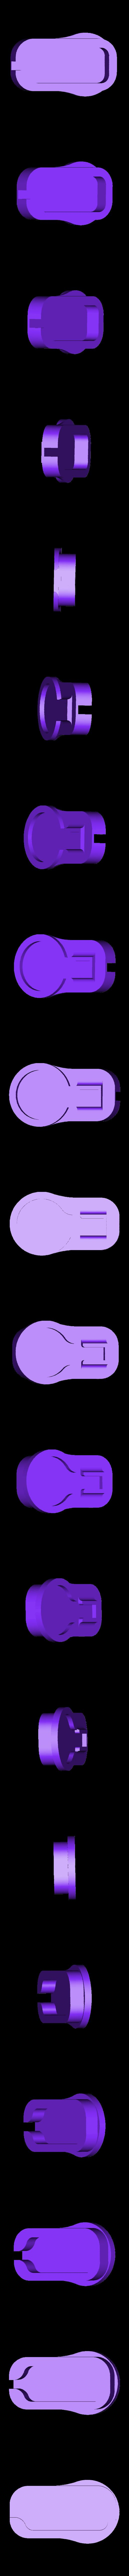 top.stl Download free STL file Rotational Bristle Bot • 3D print object, indigo4